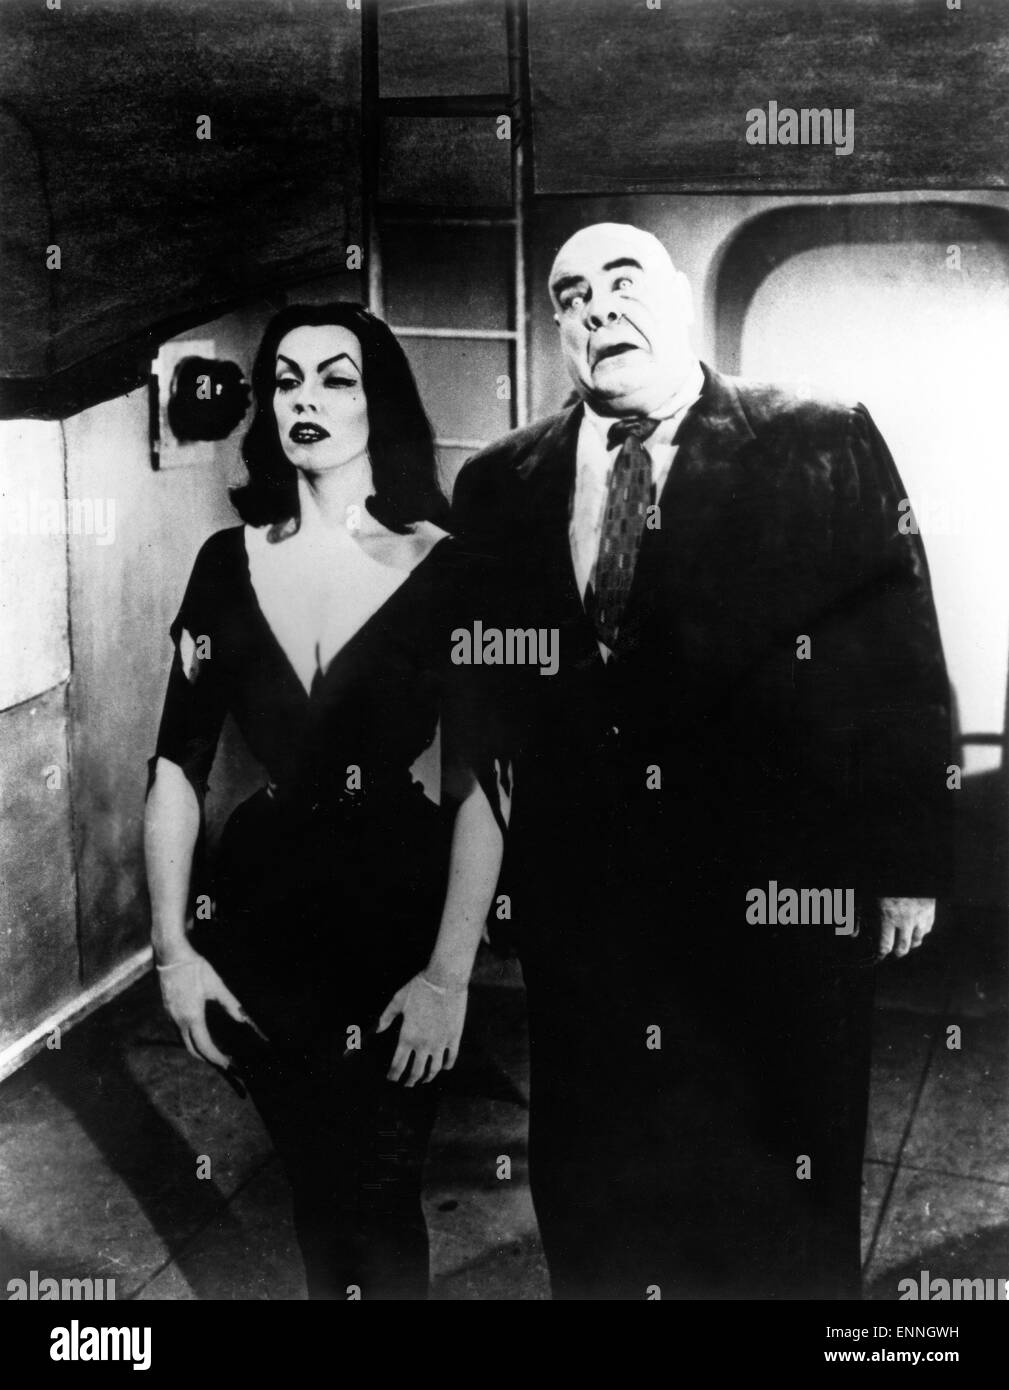 Plan 9 from Outer Space, USA 1959, Regie: Edward D. Wood Jr., Darsteller: Vampira, Tor Johnson - Stock Image